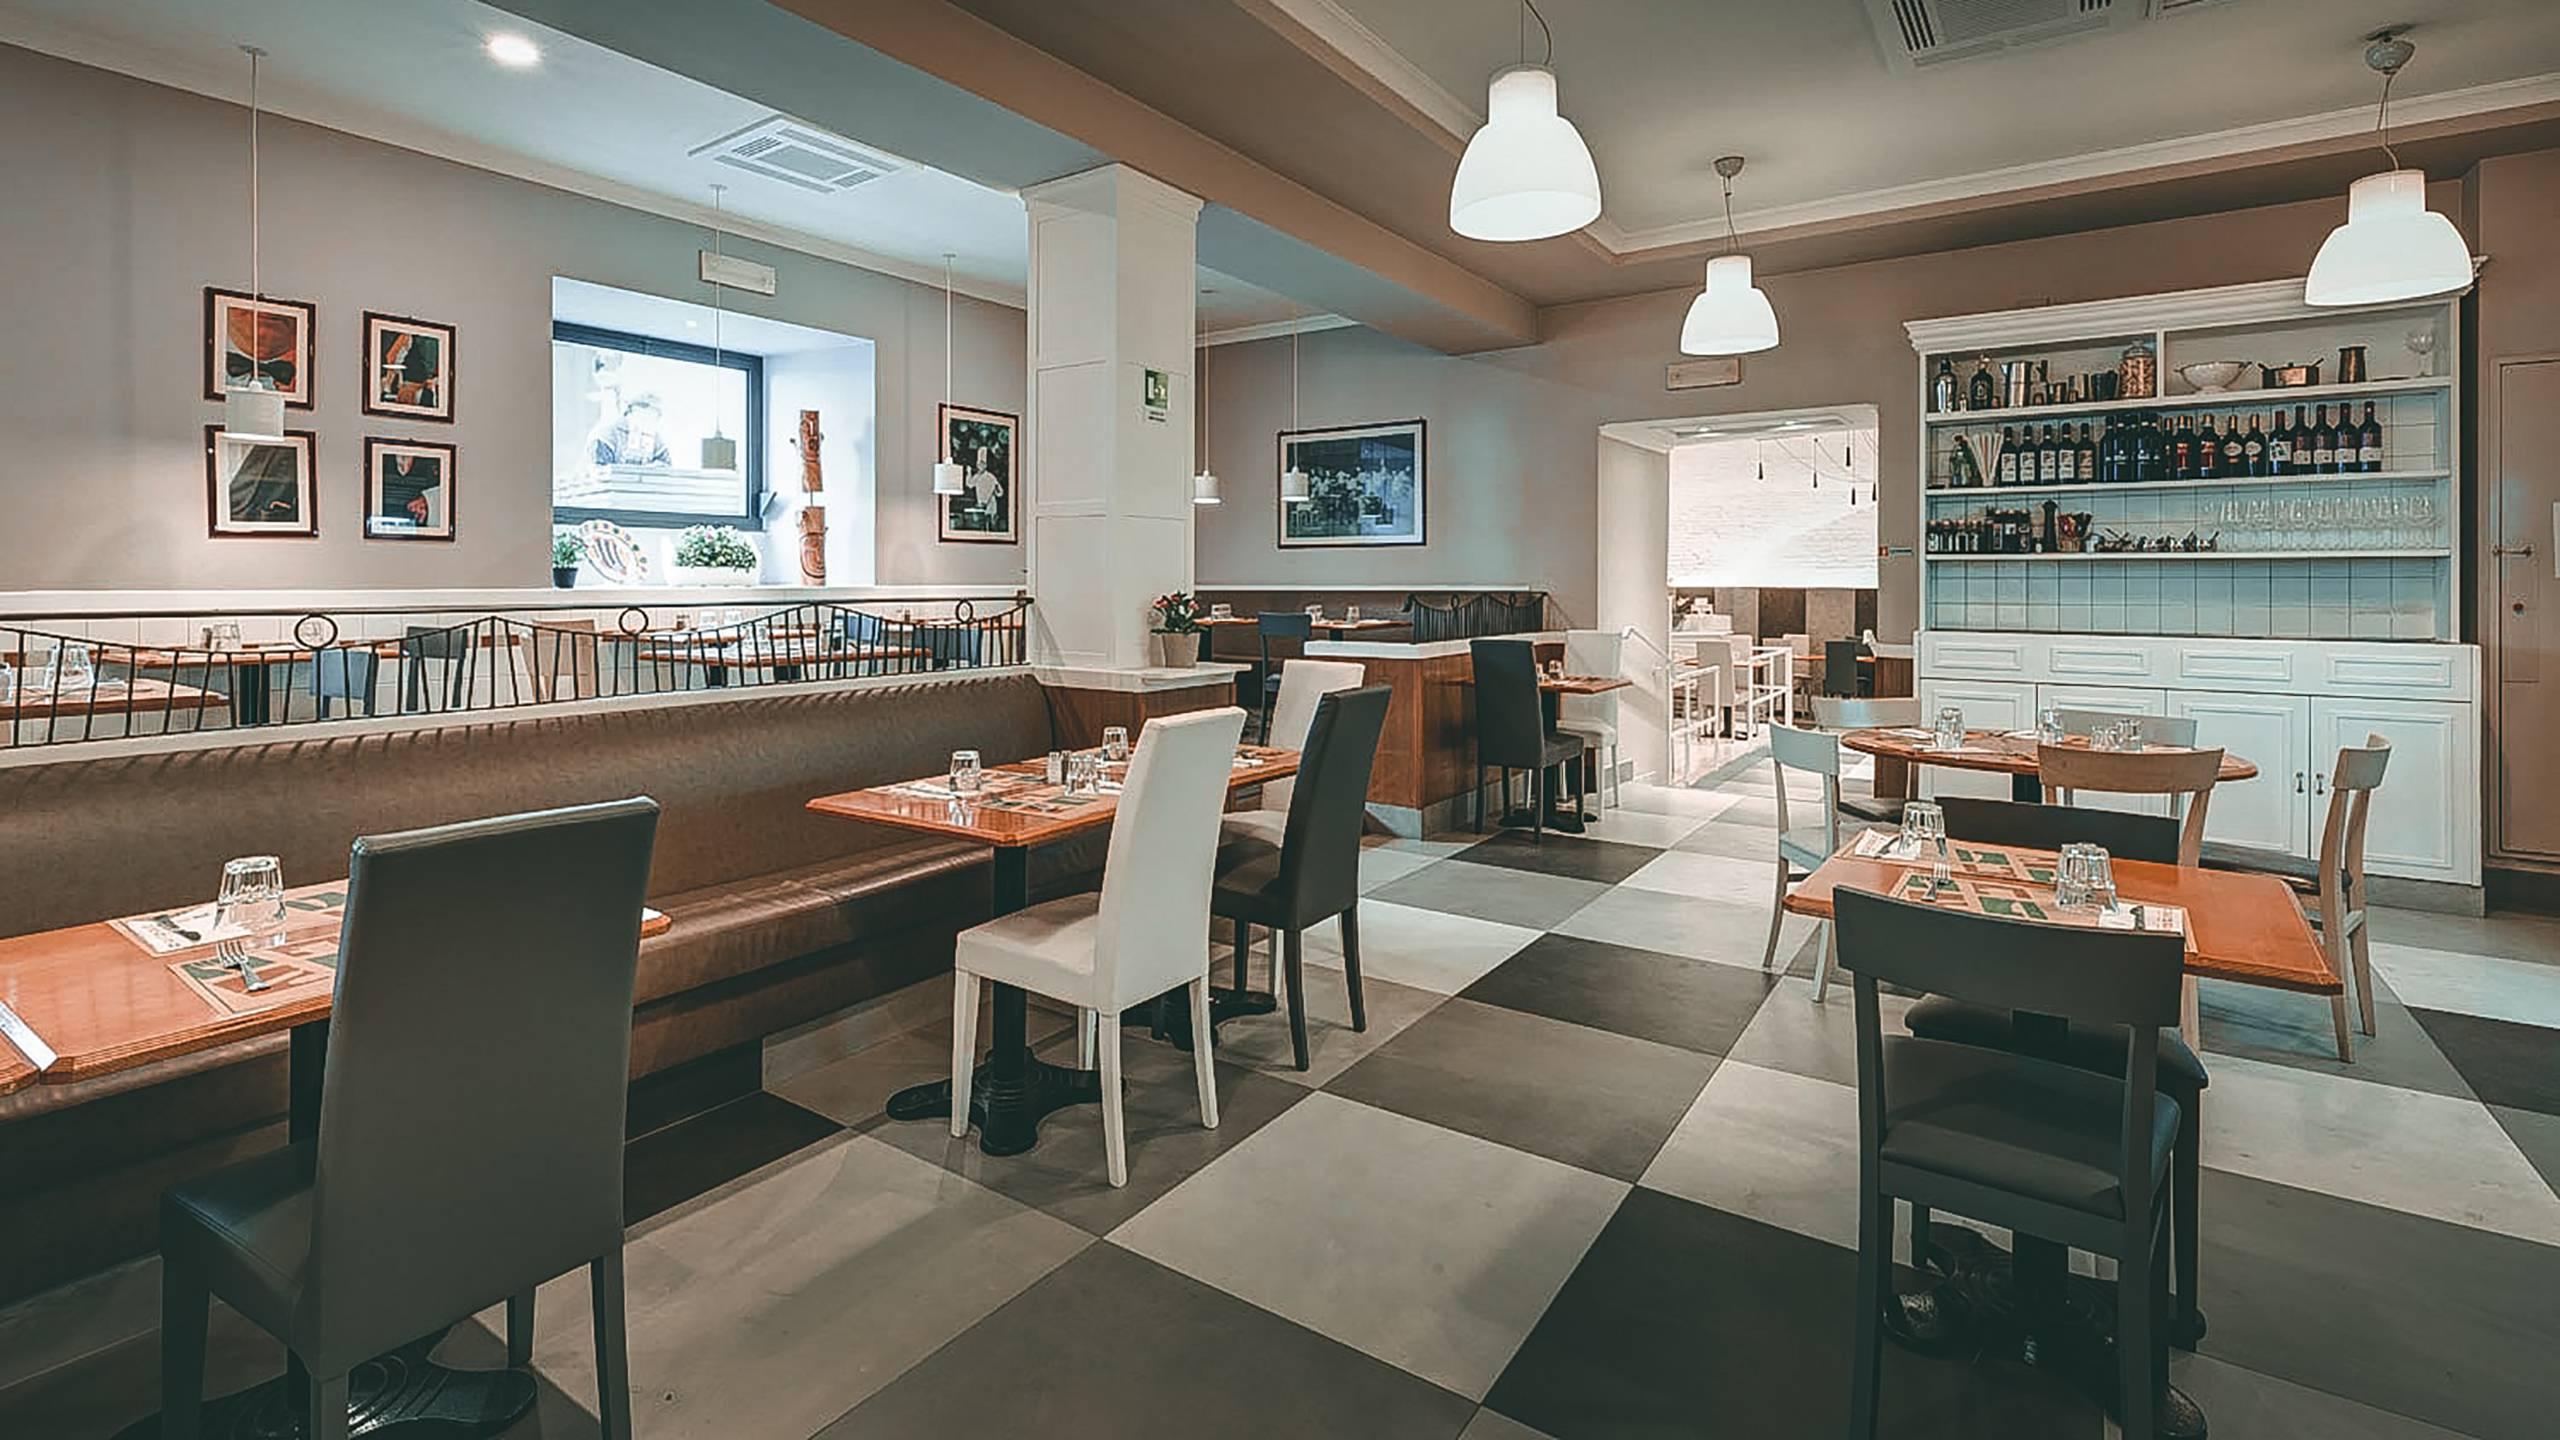 Cucina-Nazionale-Panoramica-Sala-2-2